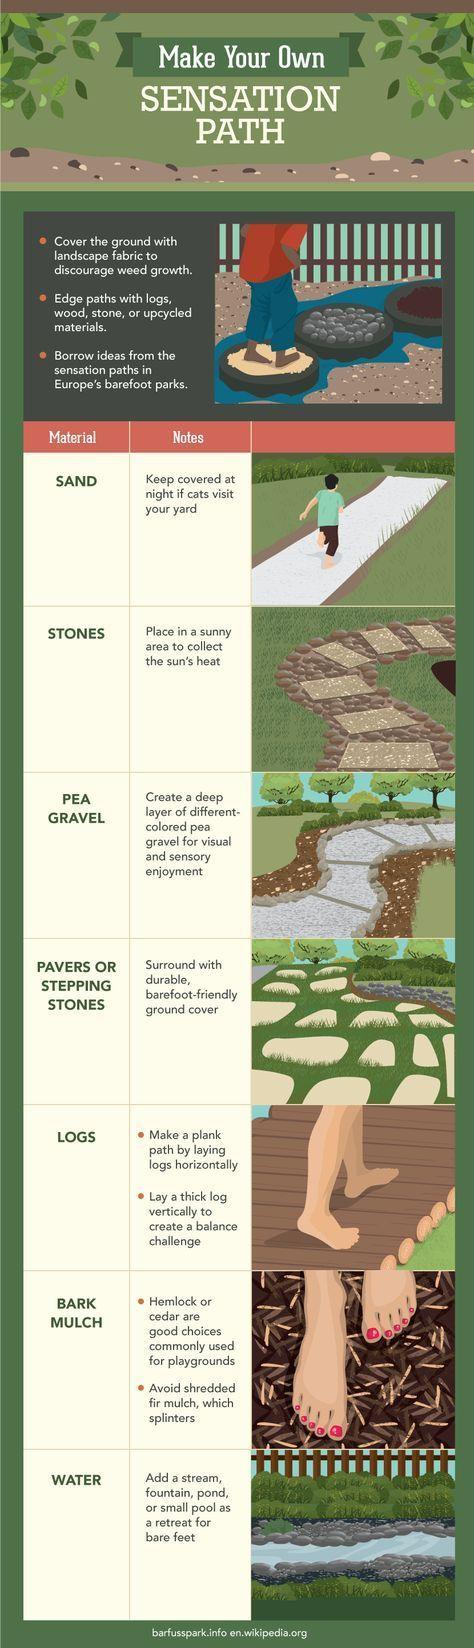 Barefoot Gardening - Make Your Own Sensation Path